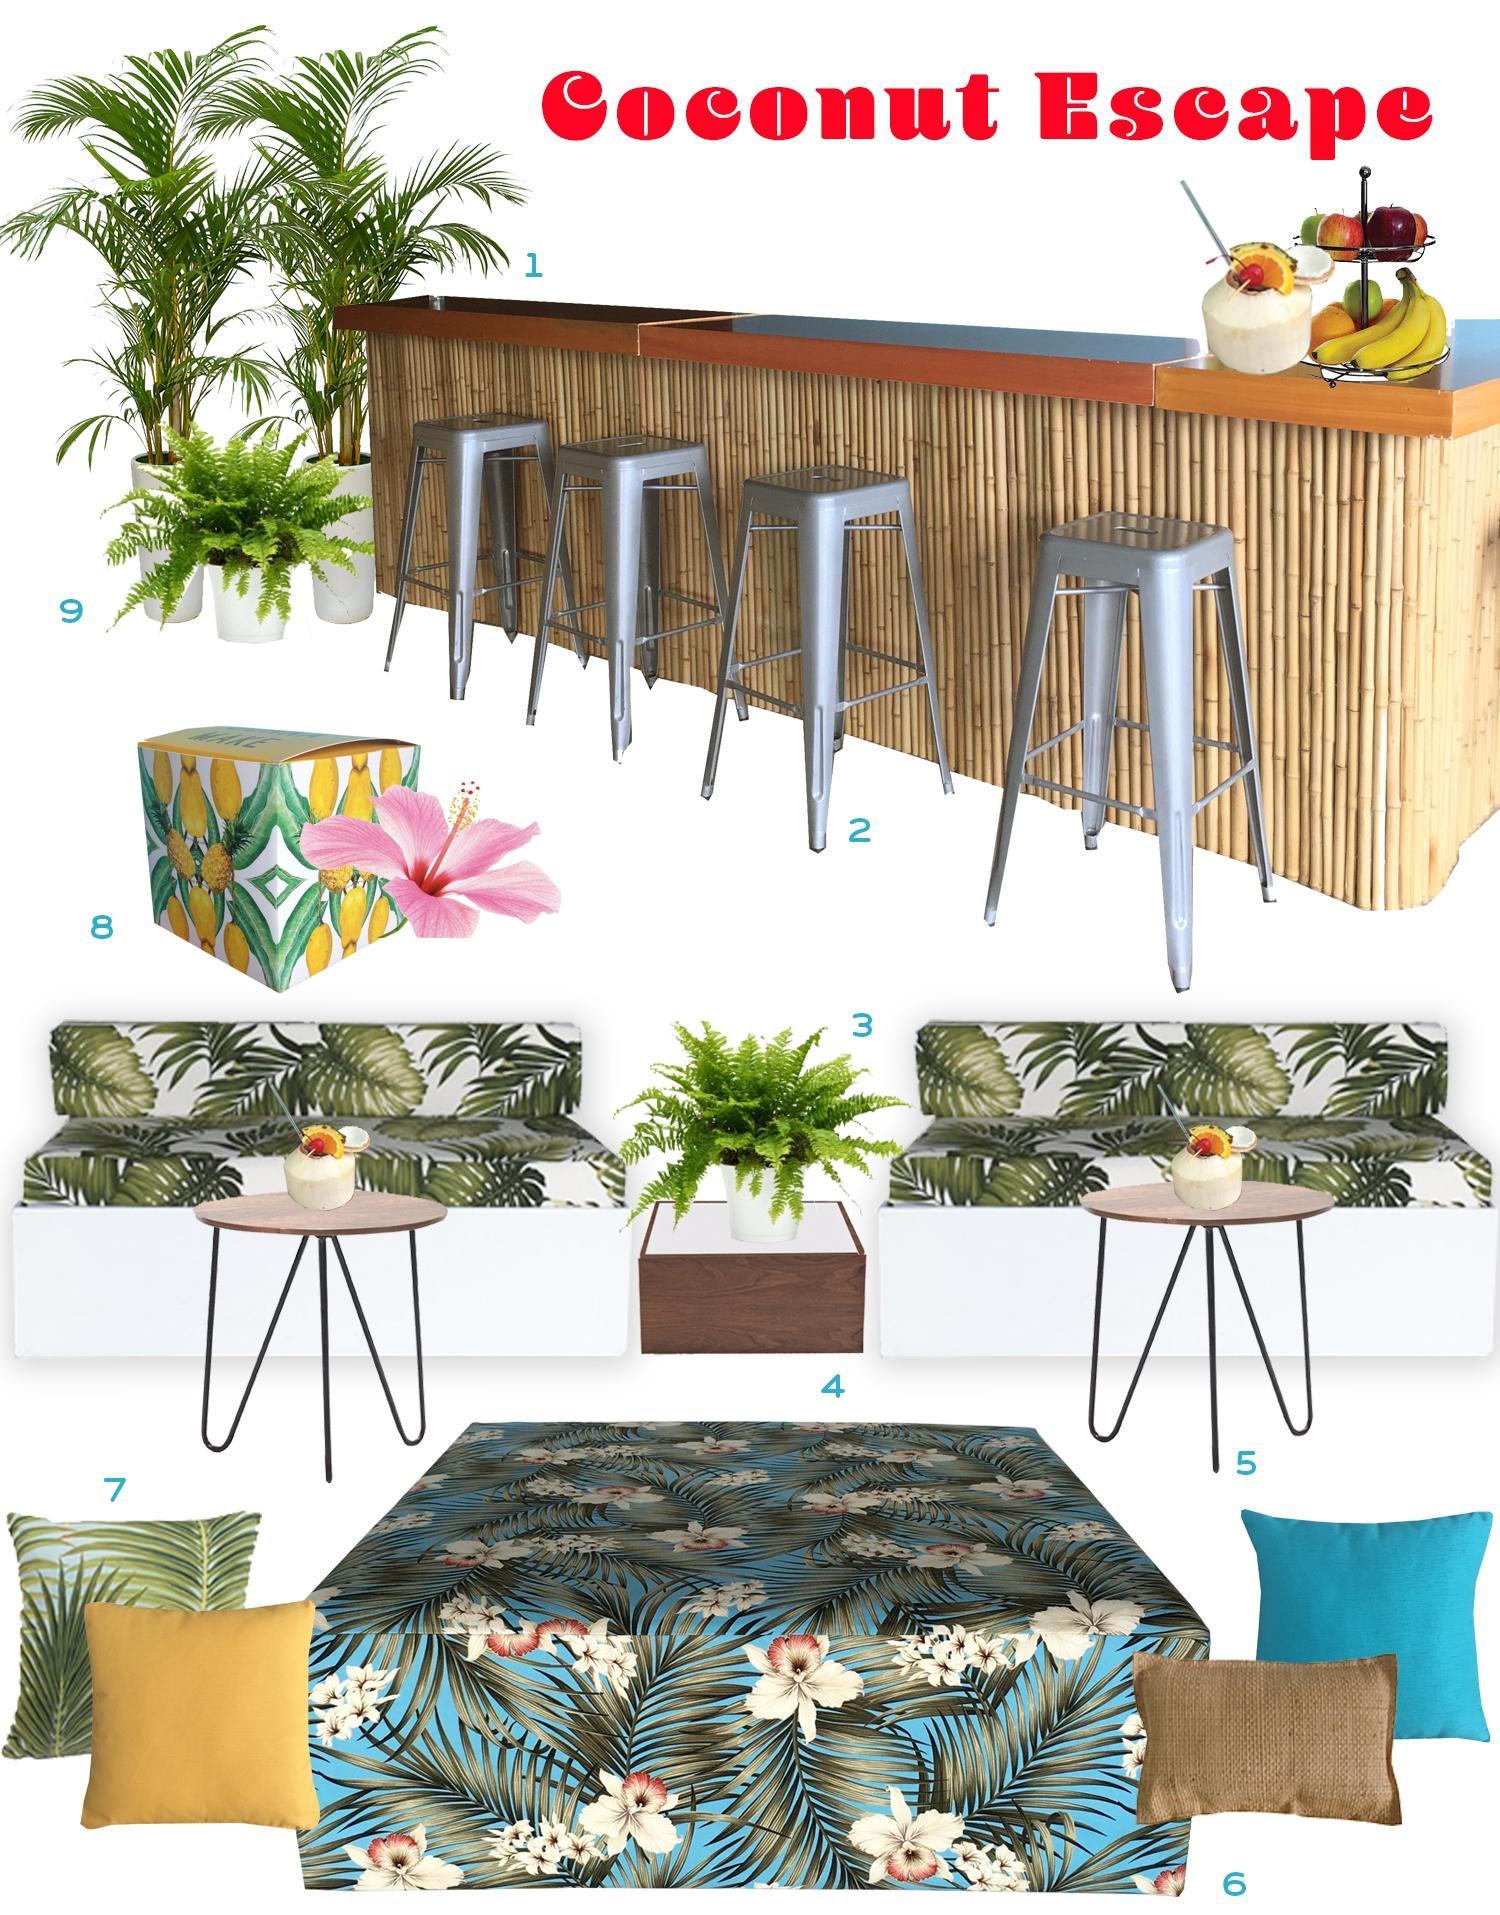 Ronen Rental - Coconut escape - Rent the look furniture